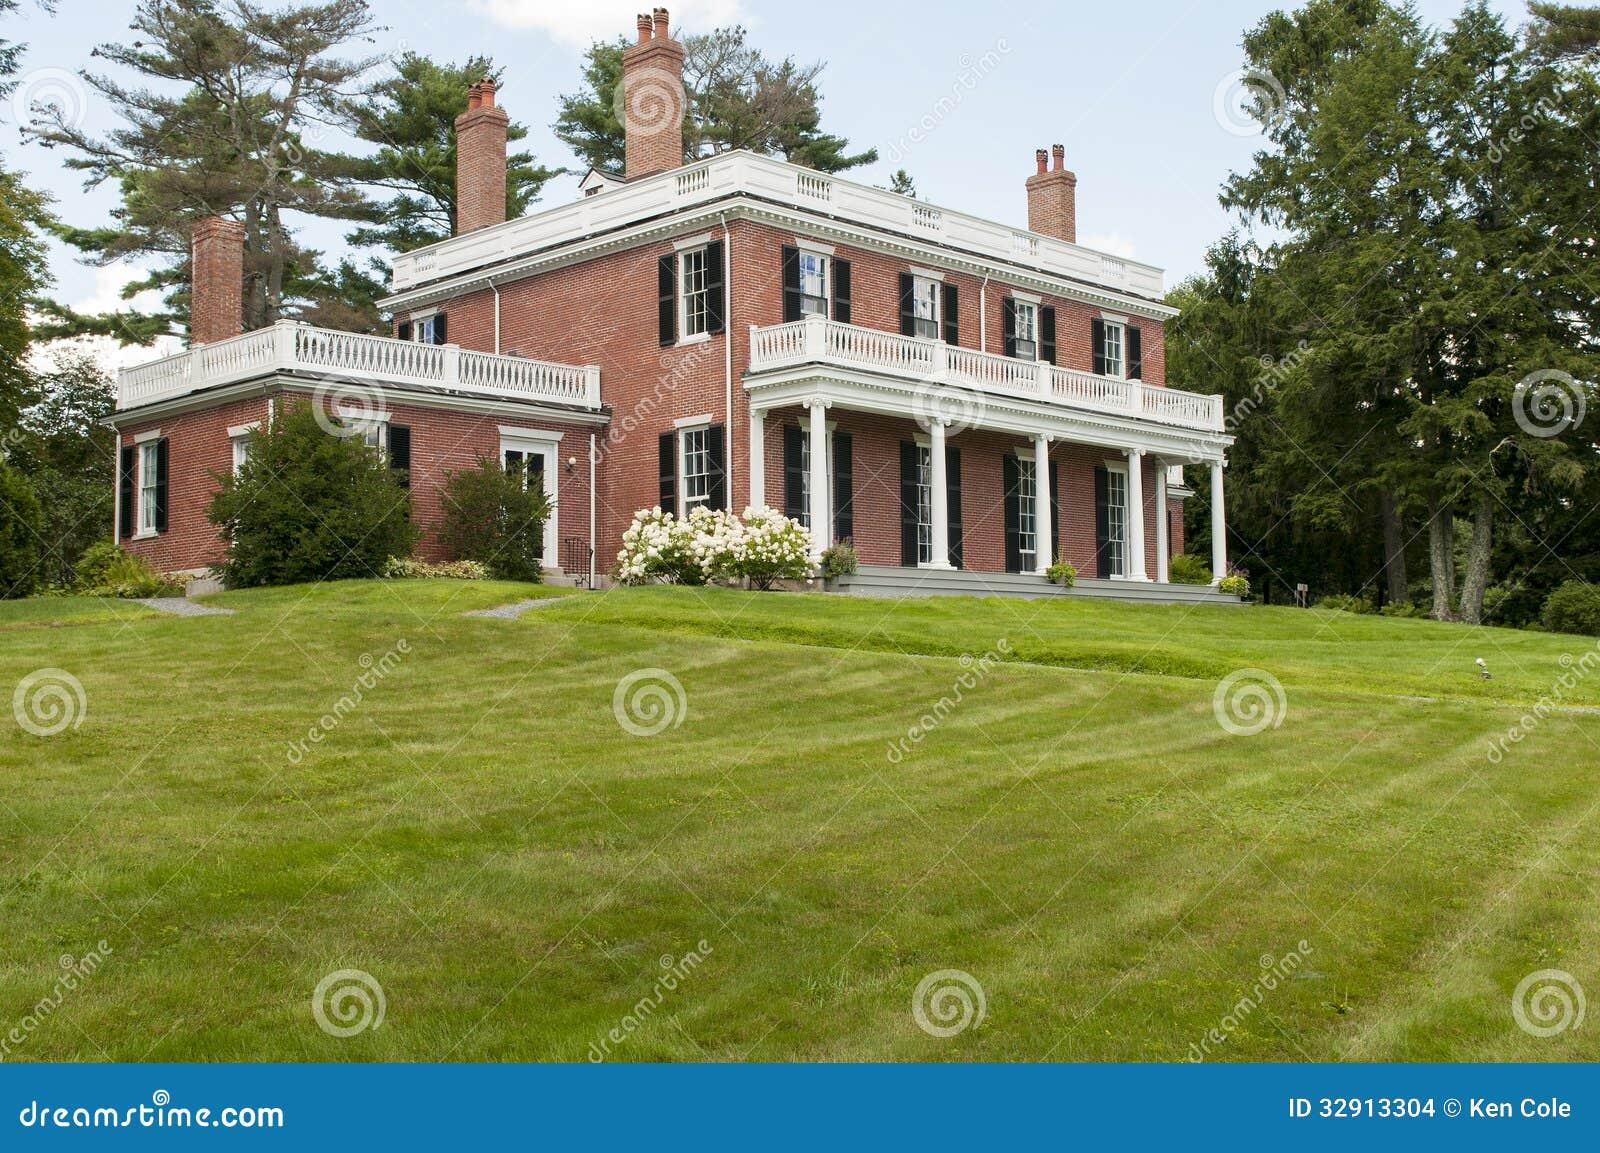 Federal Style House Plans superb old style house plans #1: elegant-brick-mansion-exterior